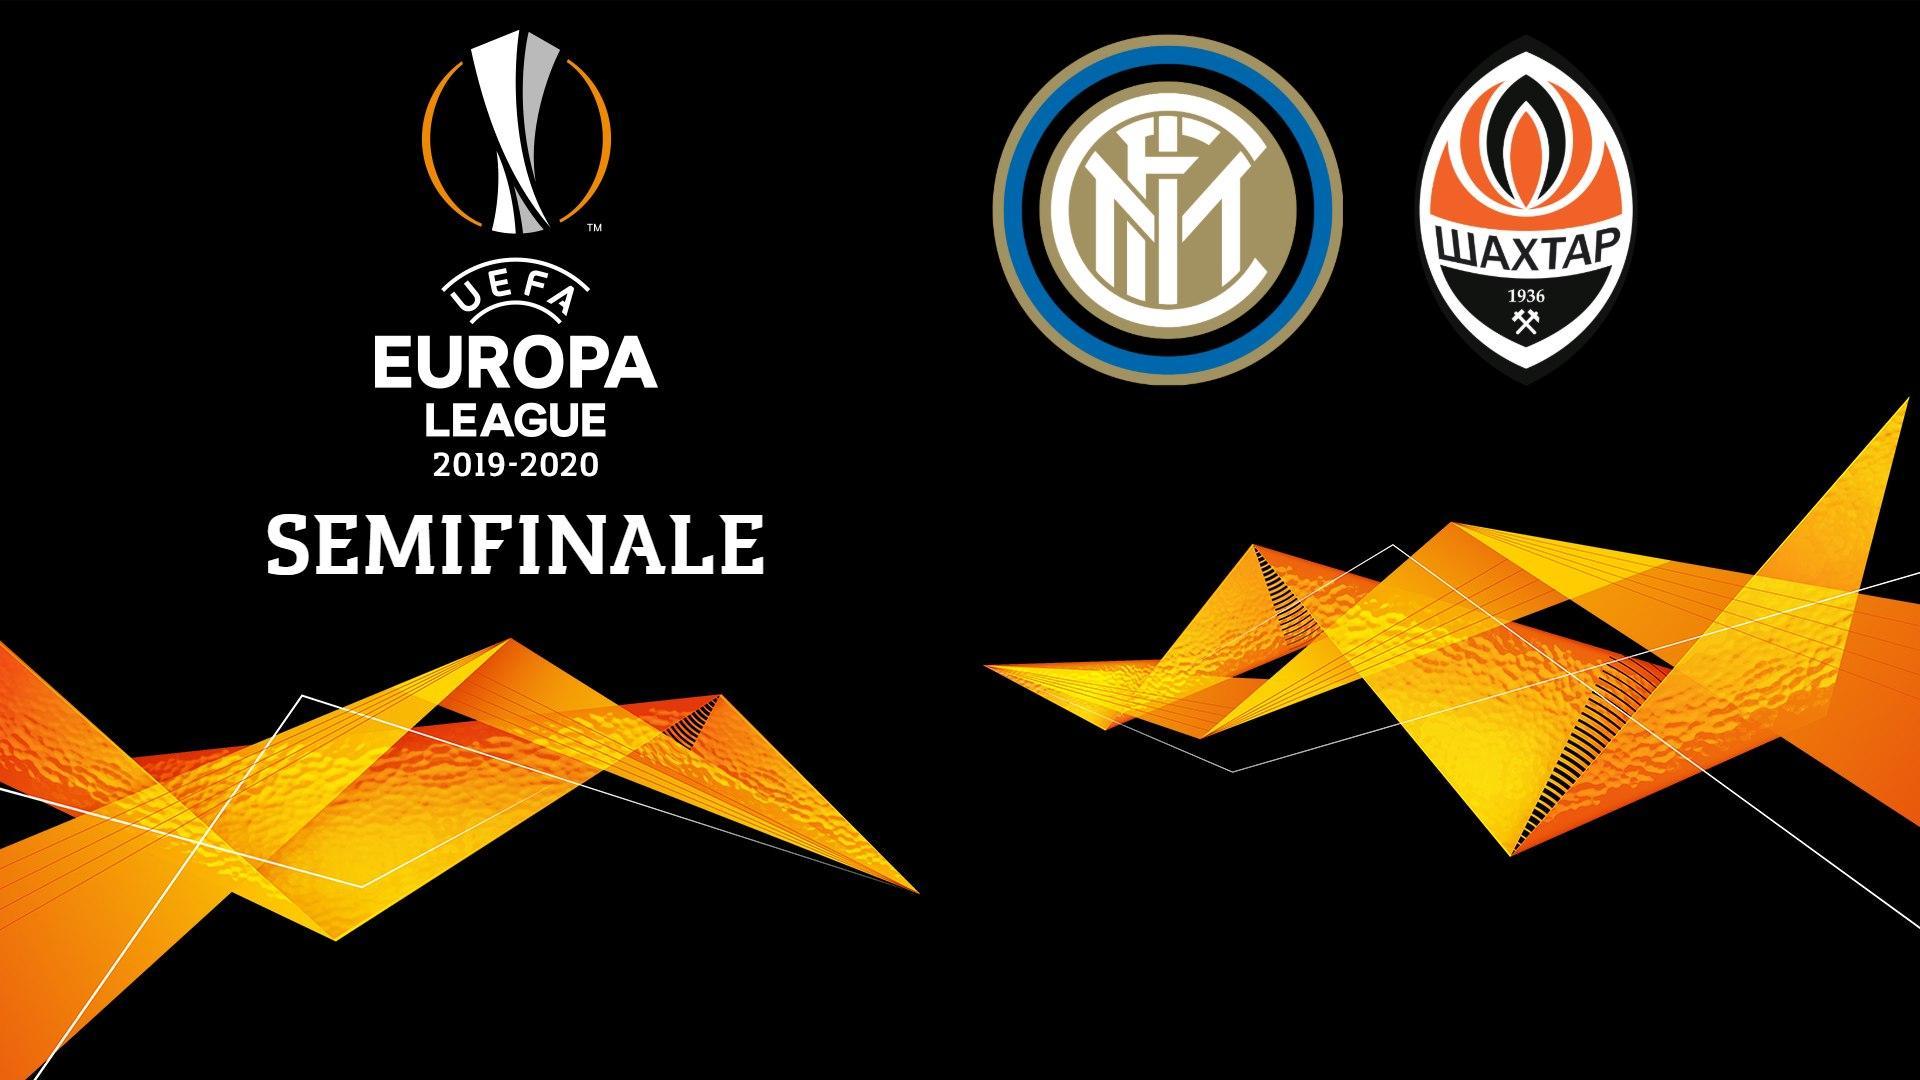 Europa League Semifinale, Inter - Shakhtar Donetsk, Diretta Sky Sport e TV8